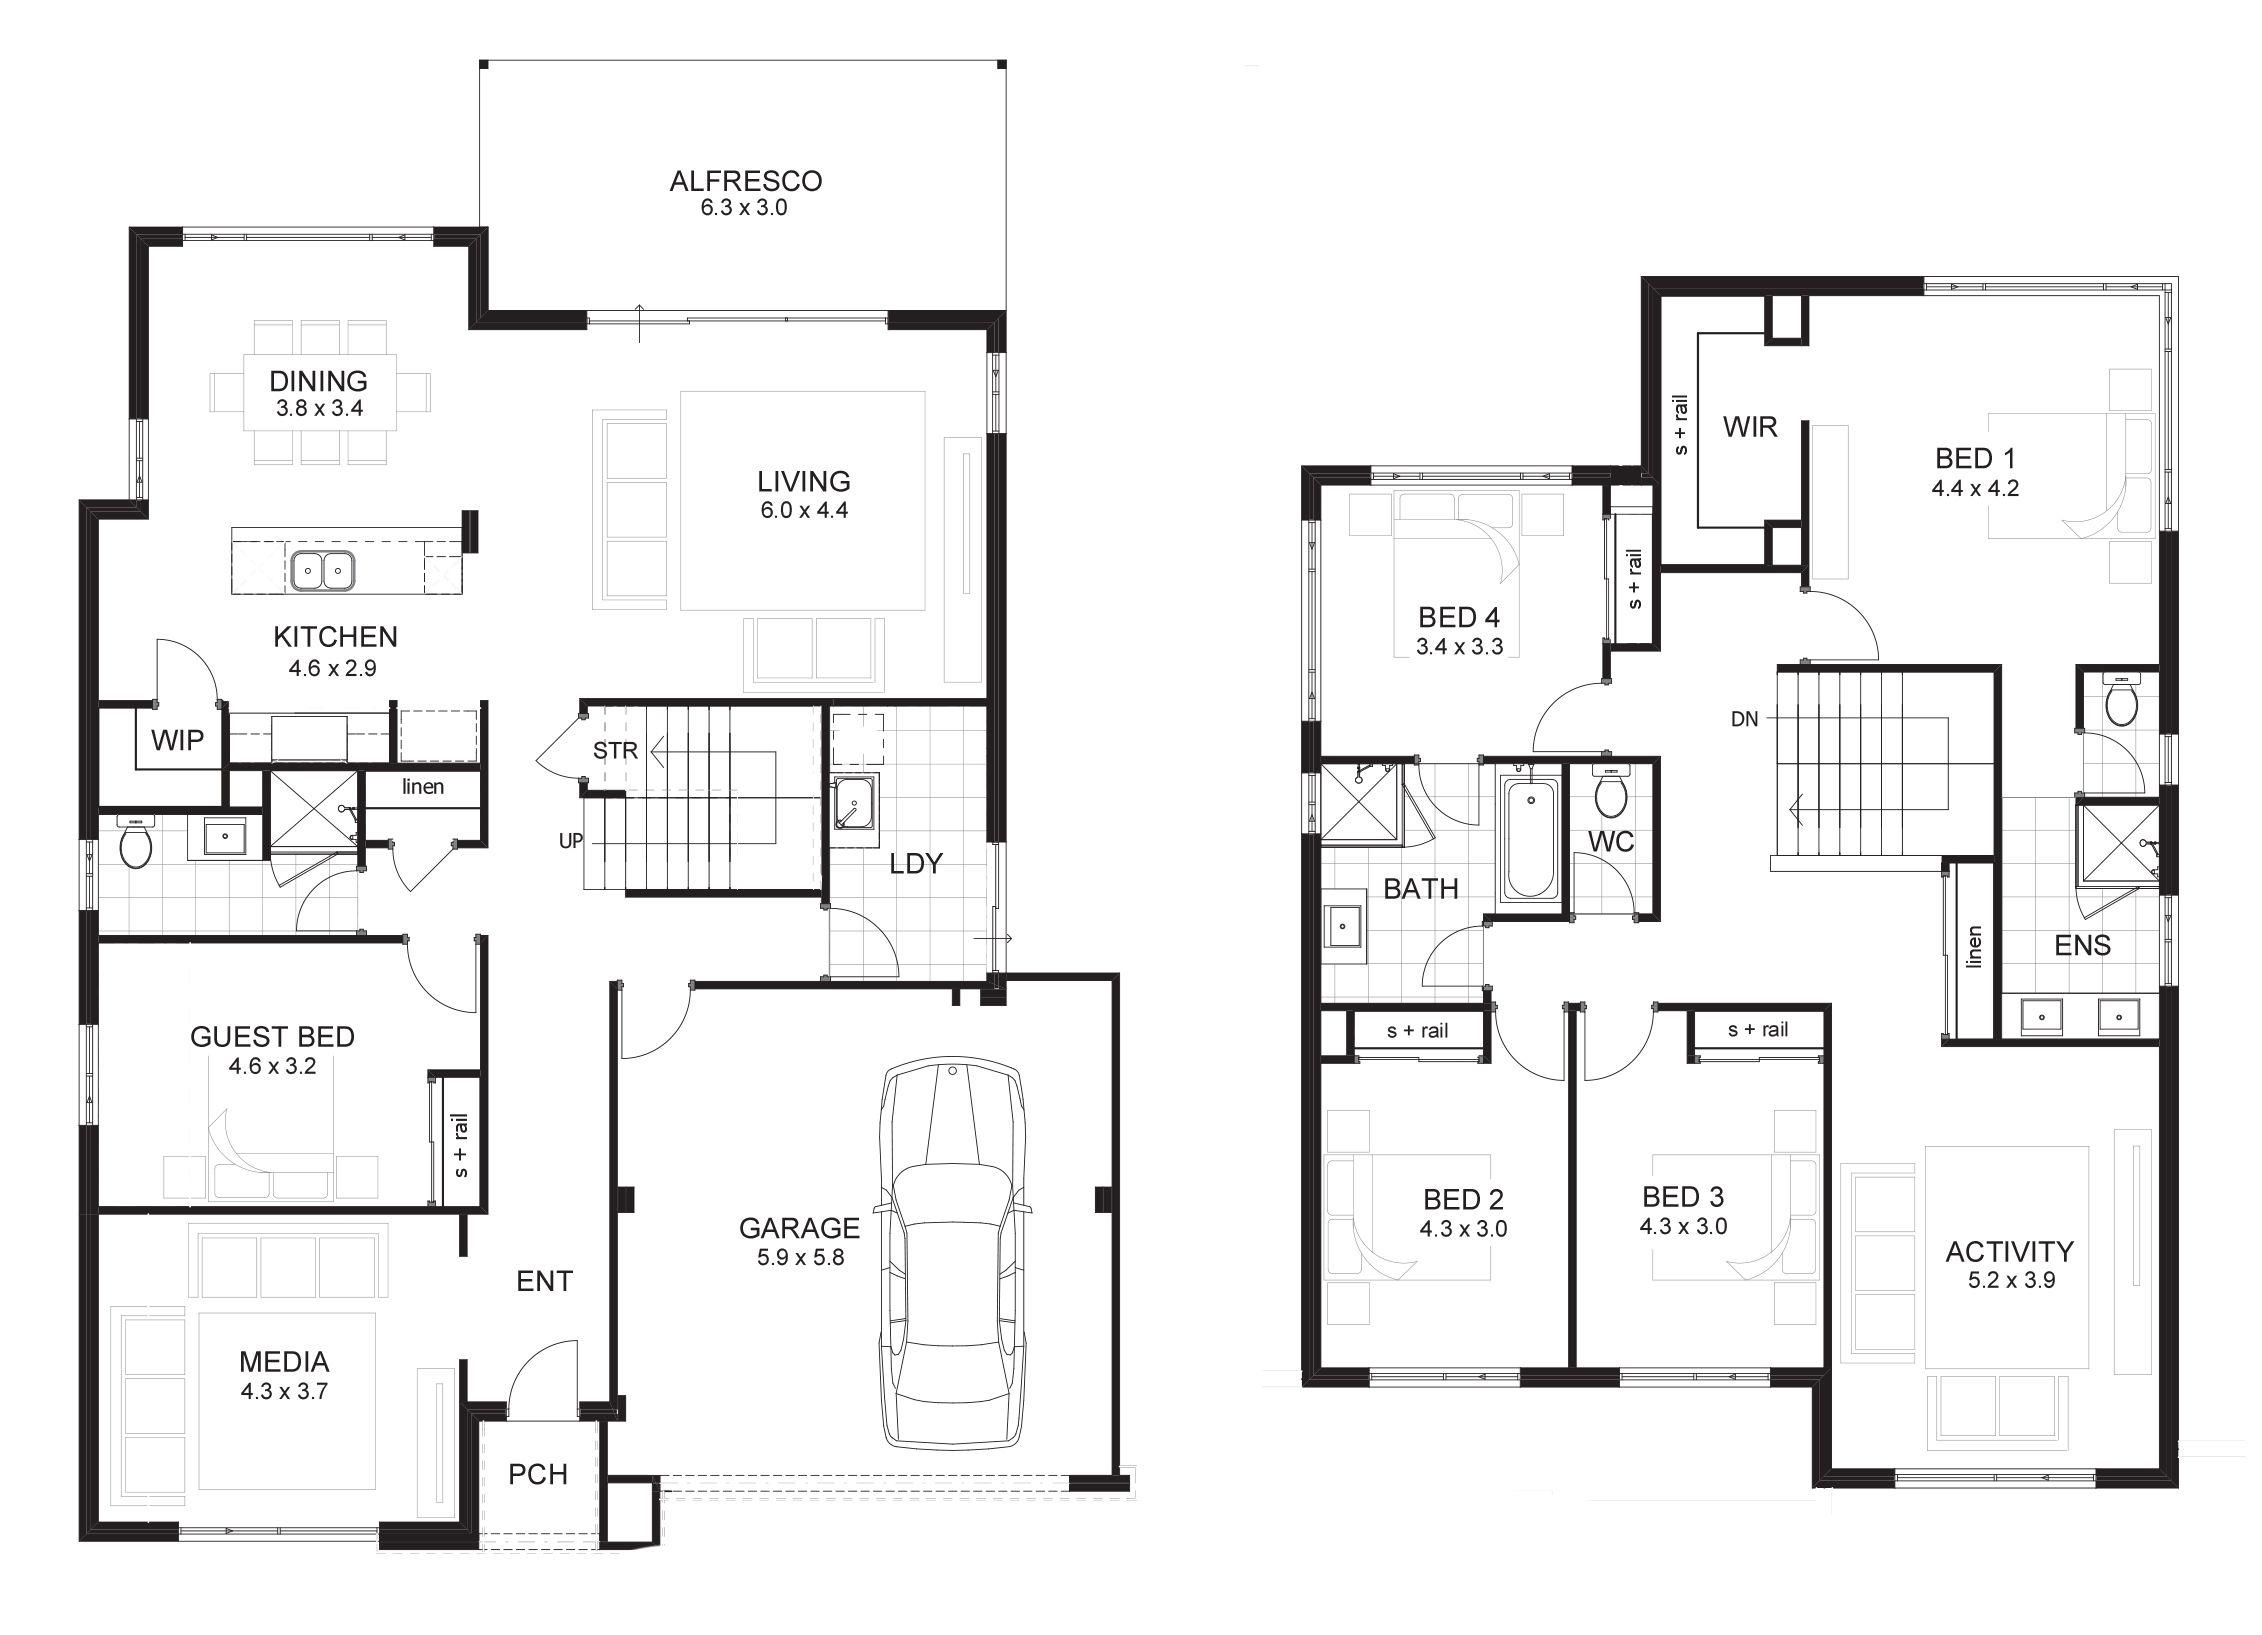 bedroom house plans perth also pinterest rh ar